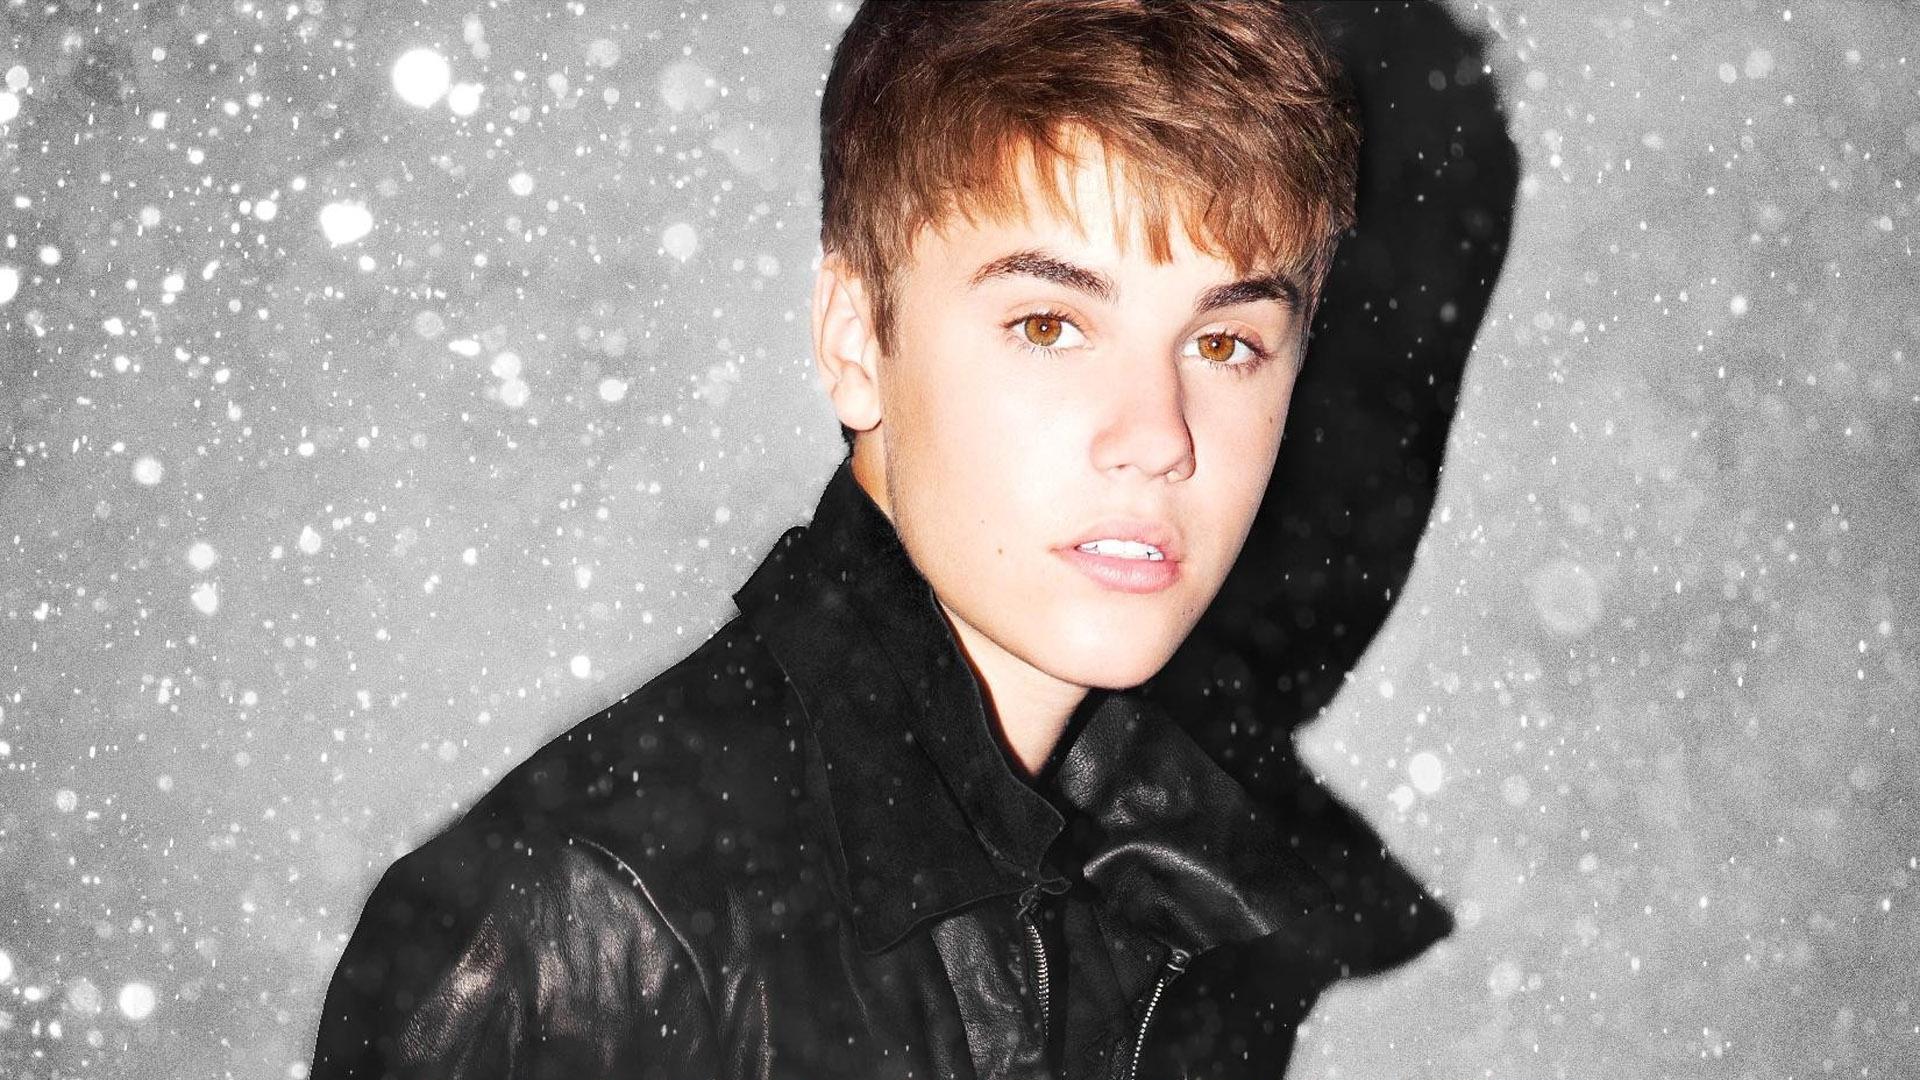 Download Justin Bieber Wallpaper Page 1